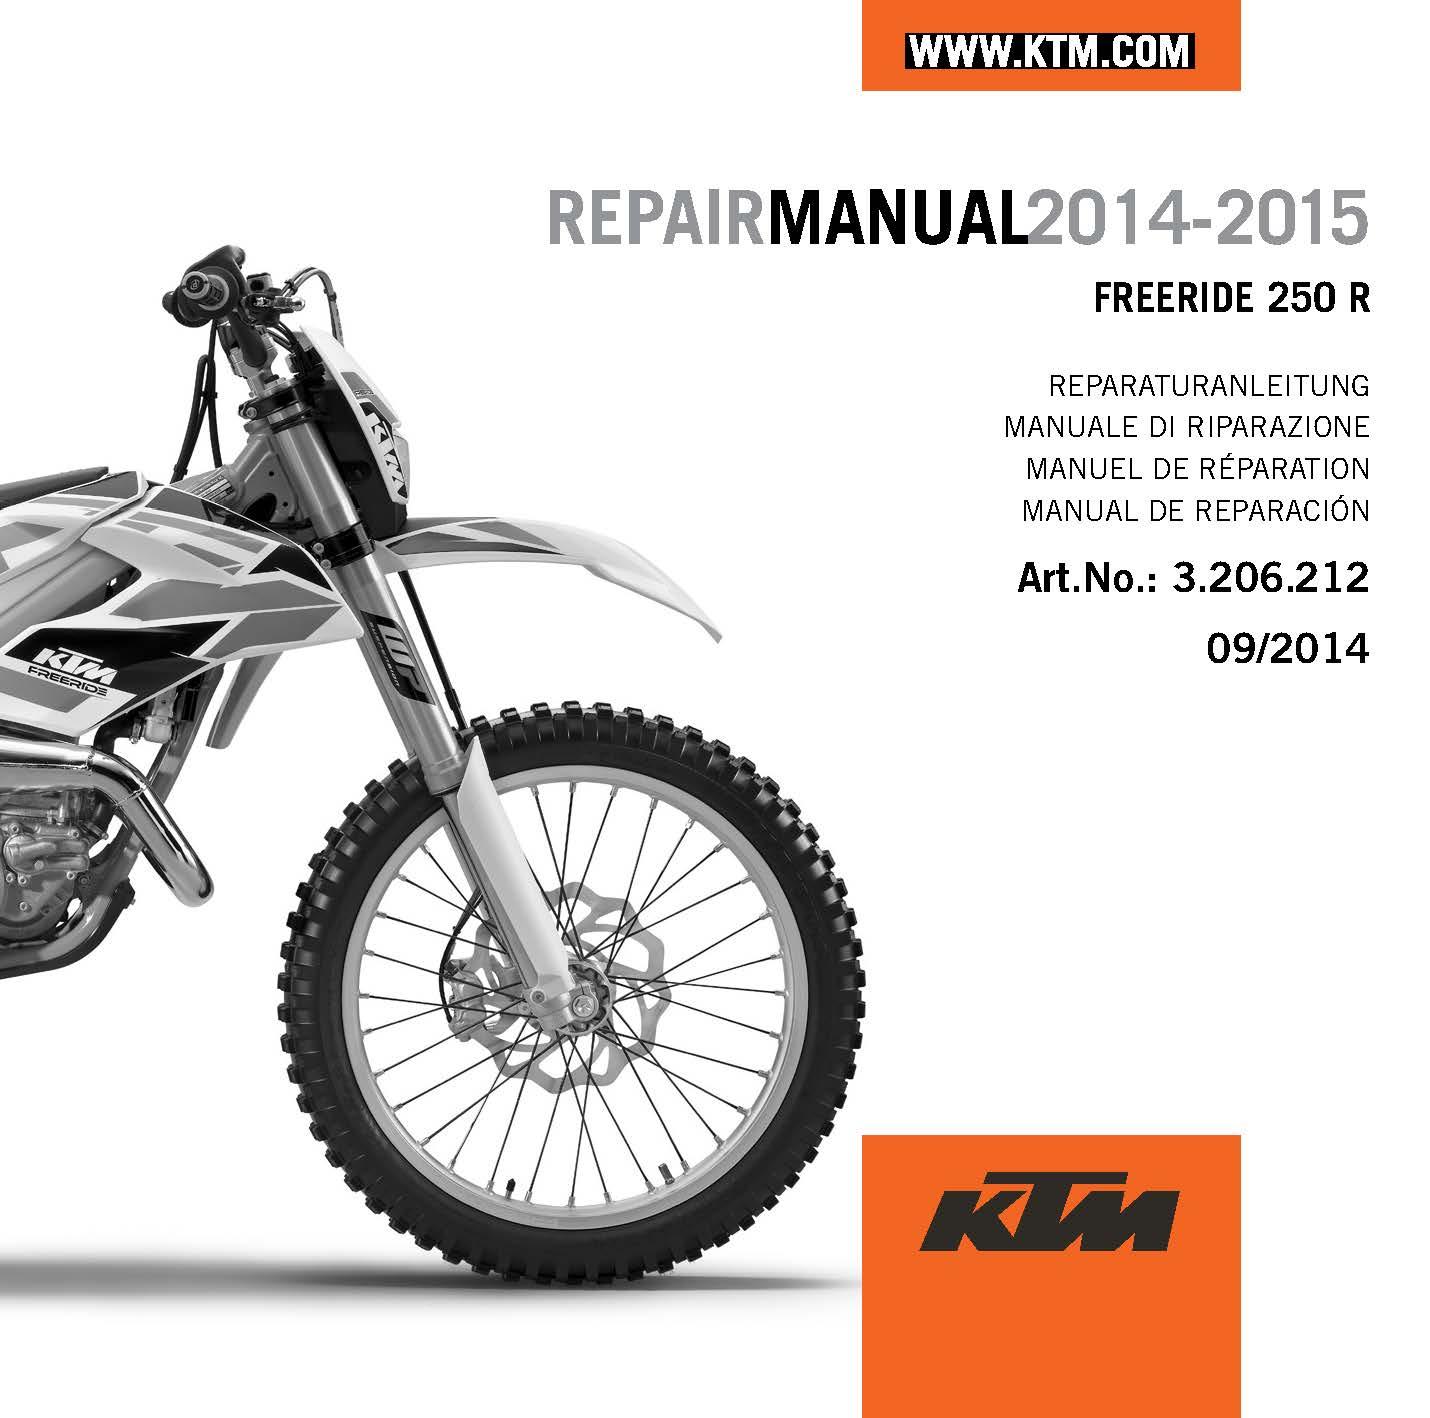 ktm 250 sxf 2013 repair manual heritage malta rh heritagemalta org 1997 KTM  250 SX KTM 125 SX